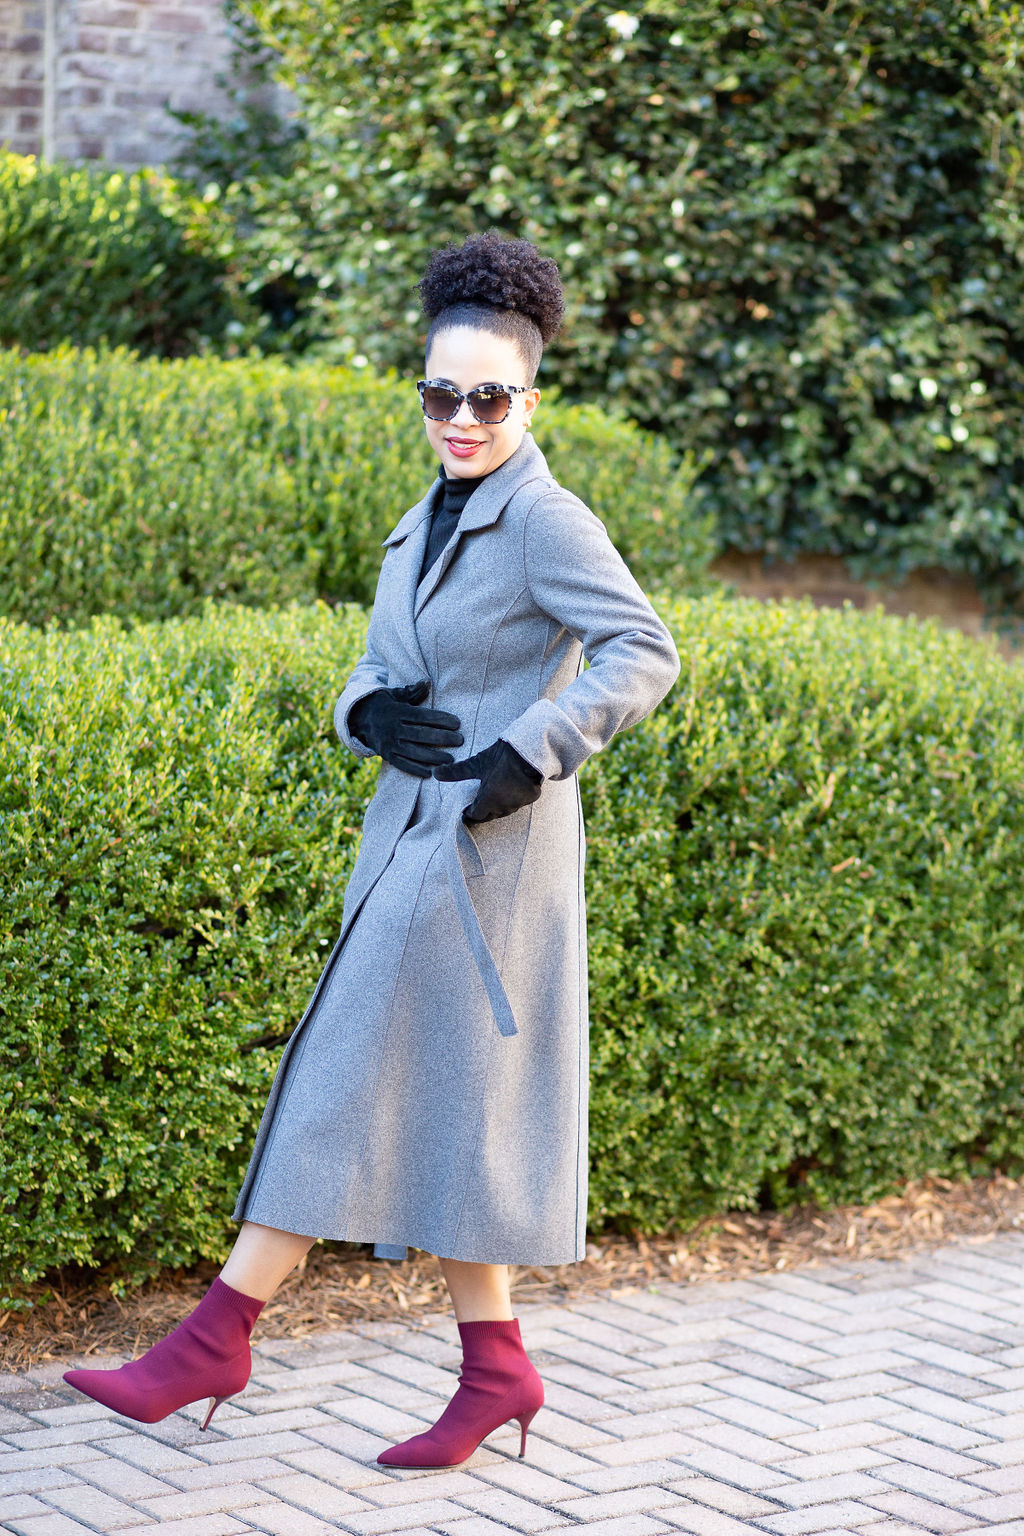 trench coat with maroon booties.jpg